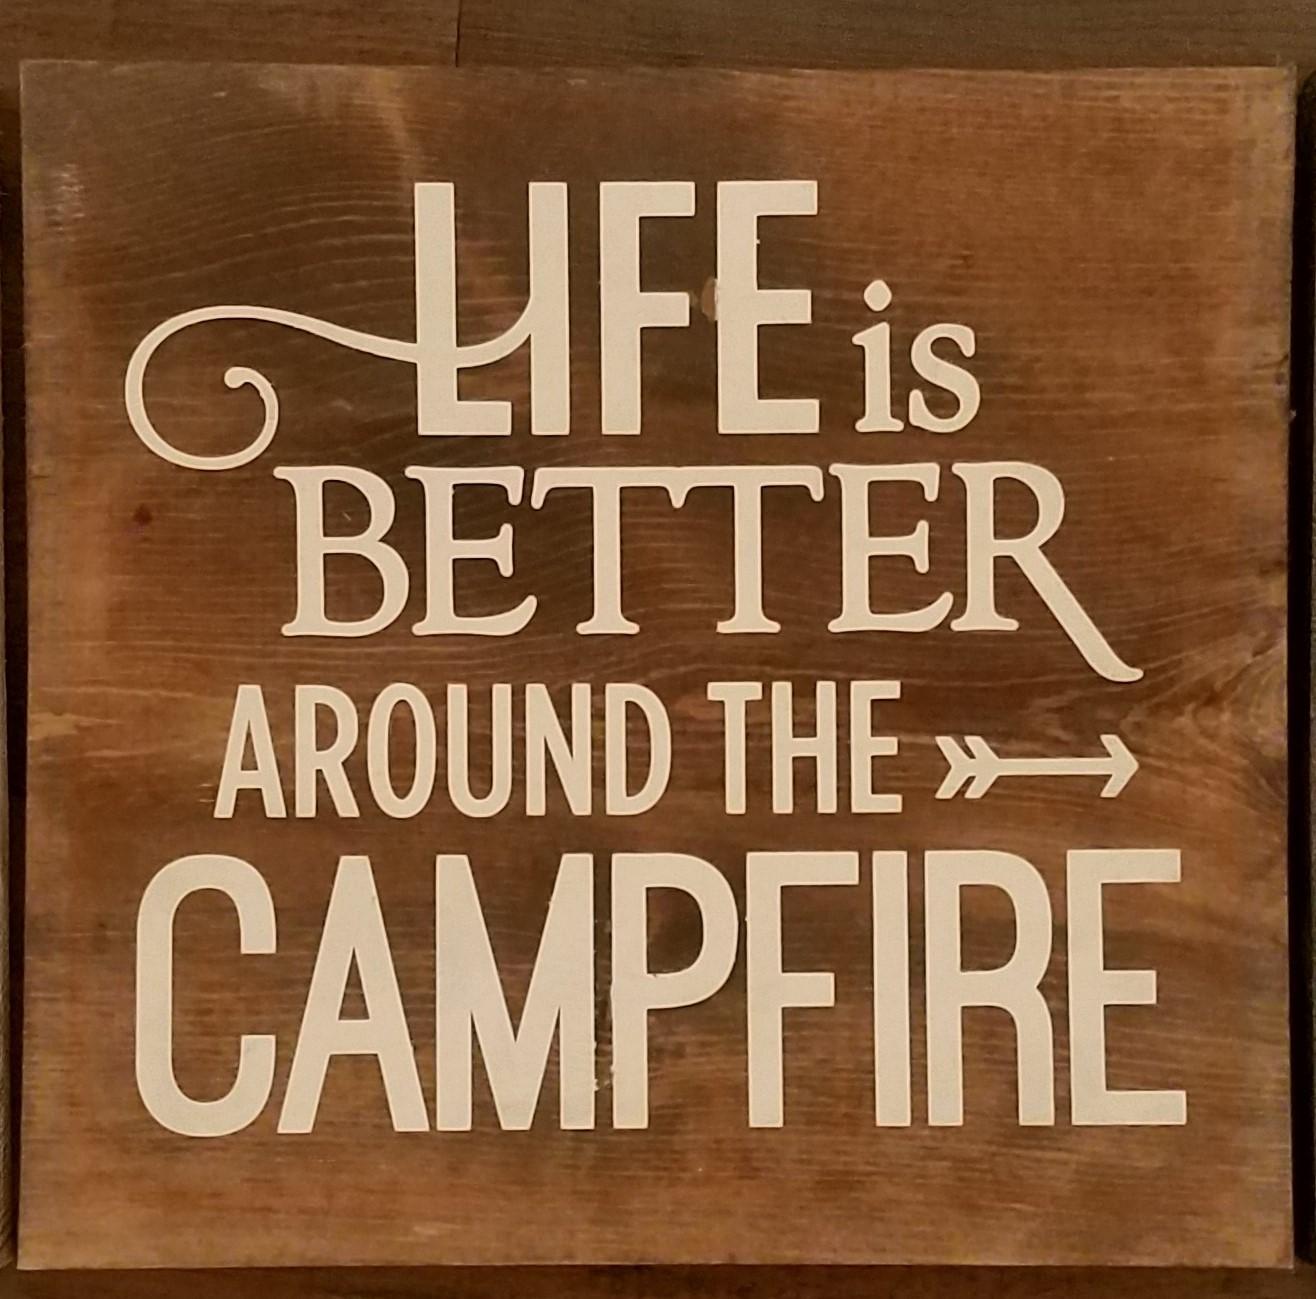 #1. Campfire